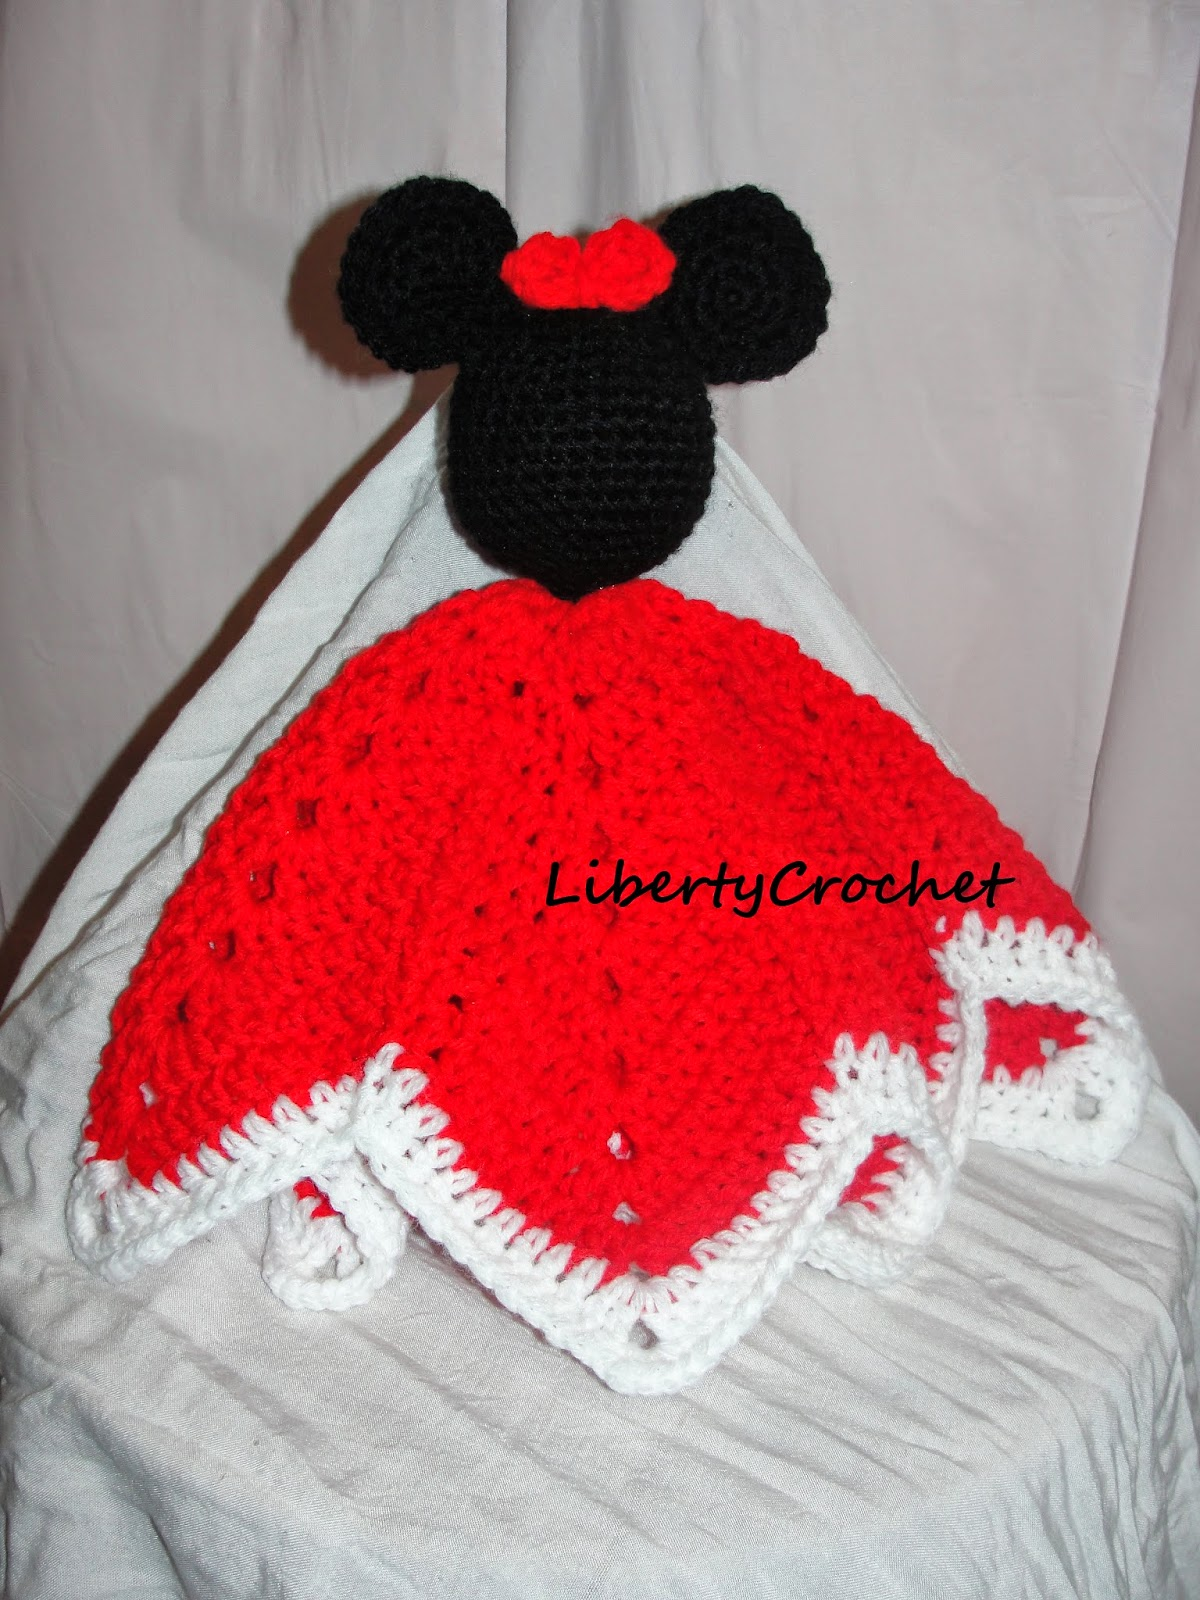 libertycrochet: Mouse head lovey*